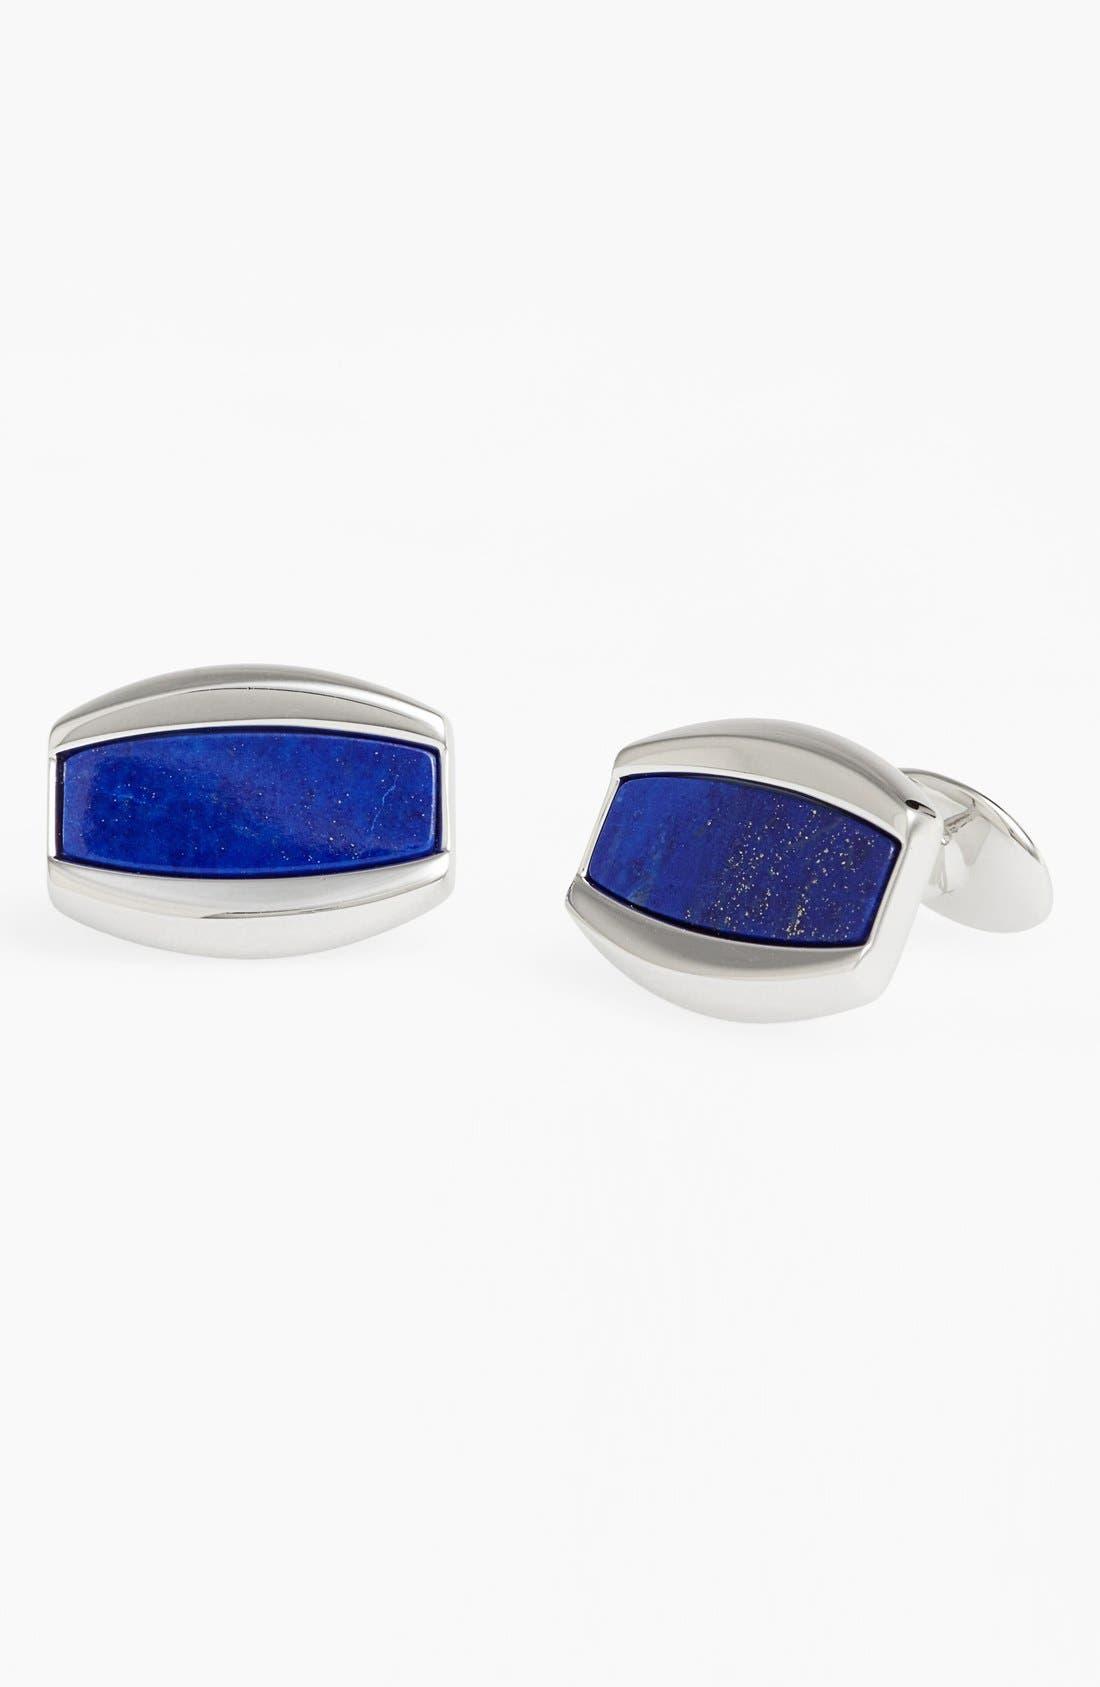 Lapis Lazuli Cuff Links,                         Main,                         color, SILVER/ BLUE